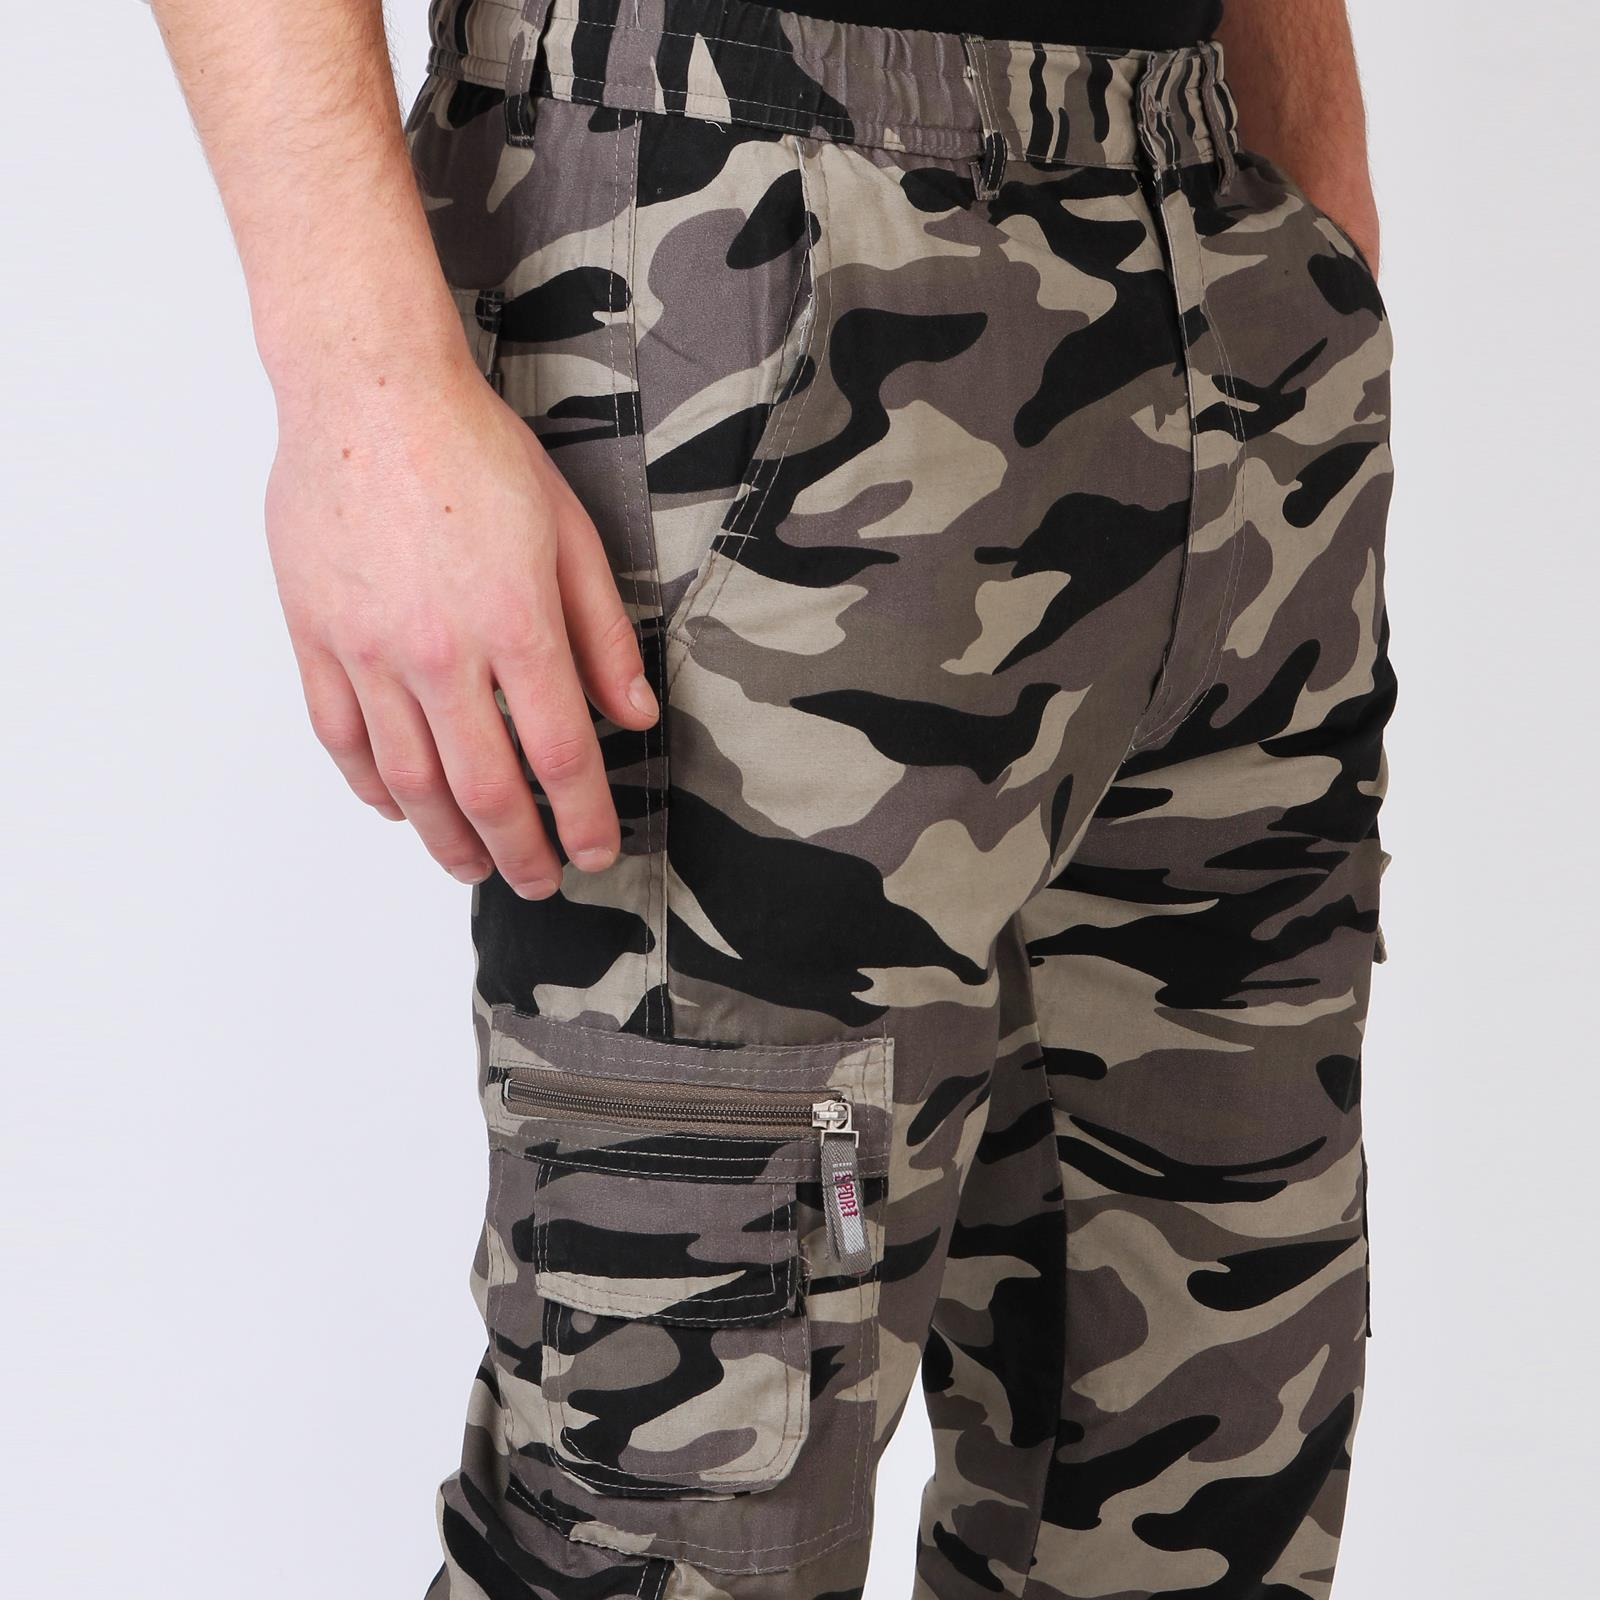 Homme-Pantalon-Imprime-Camouflage-Cargo-Multi-Poches-Style-Militaire miniature 9